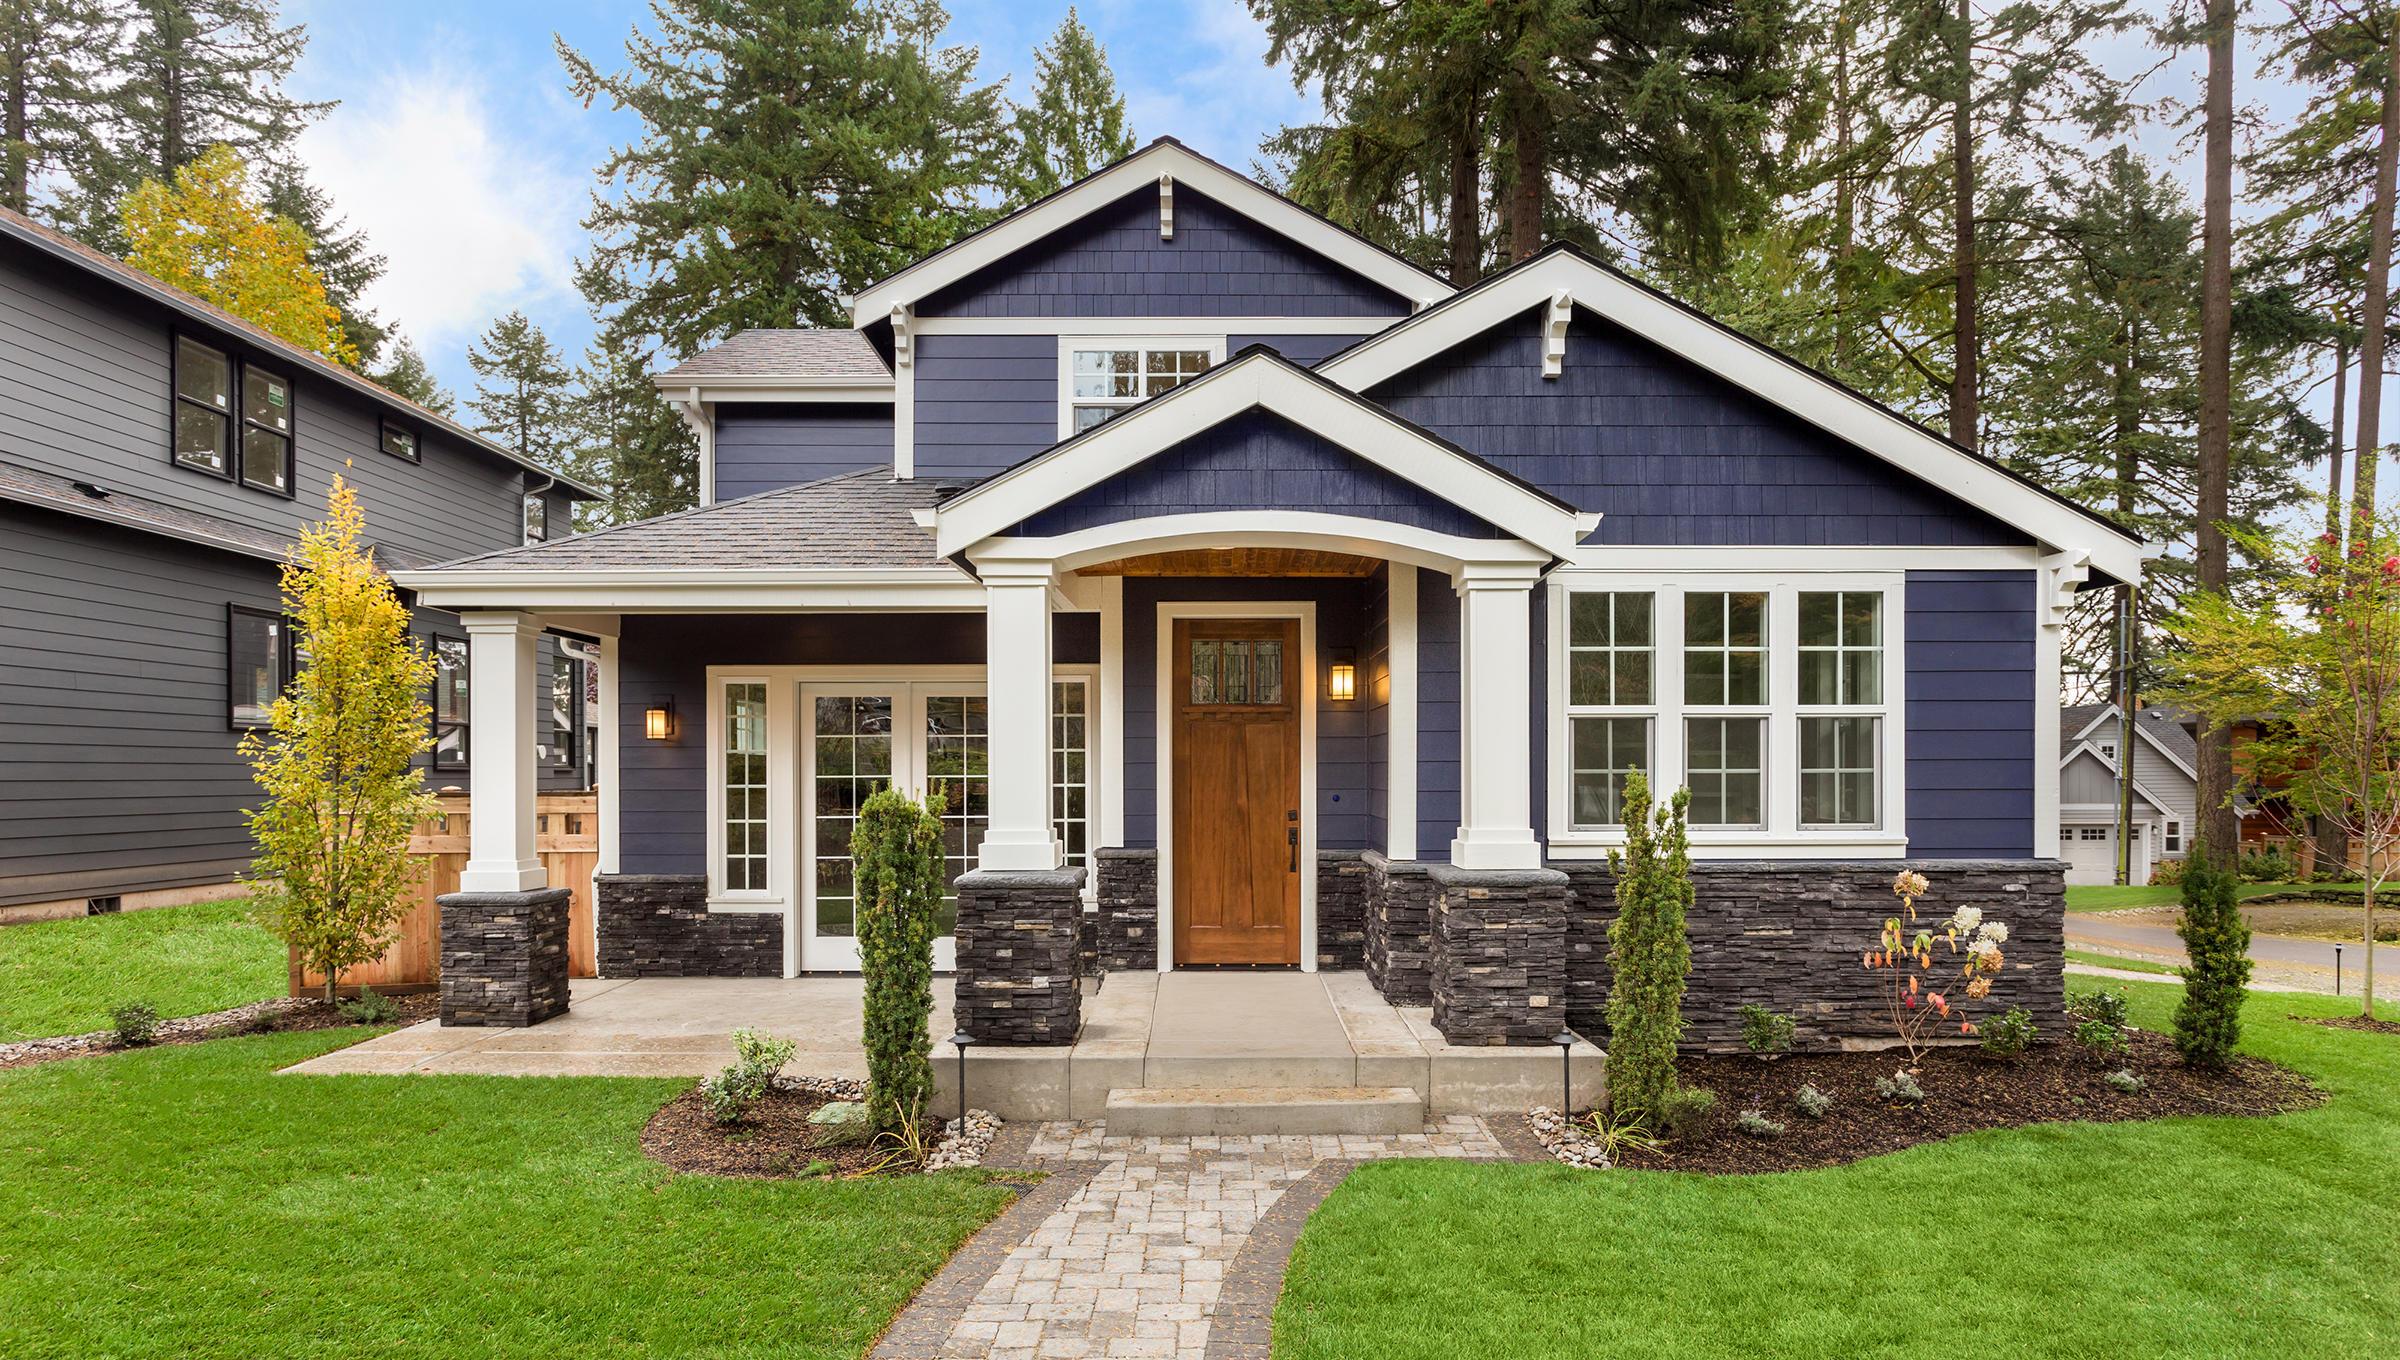 Stewardship Property Solutions